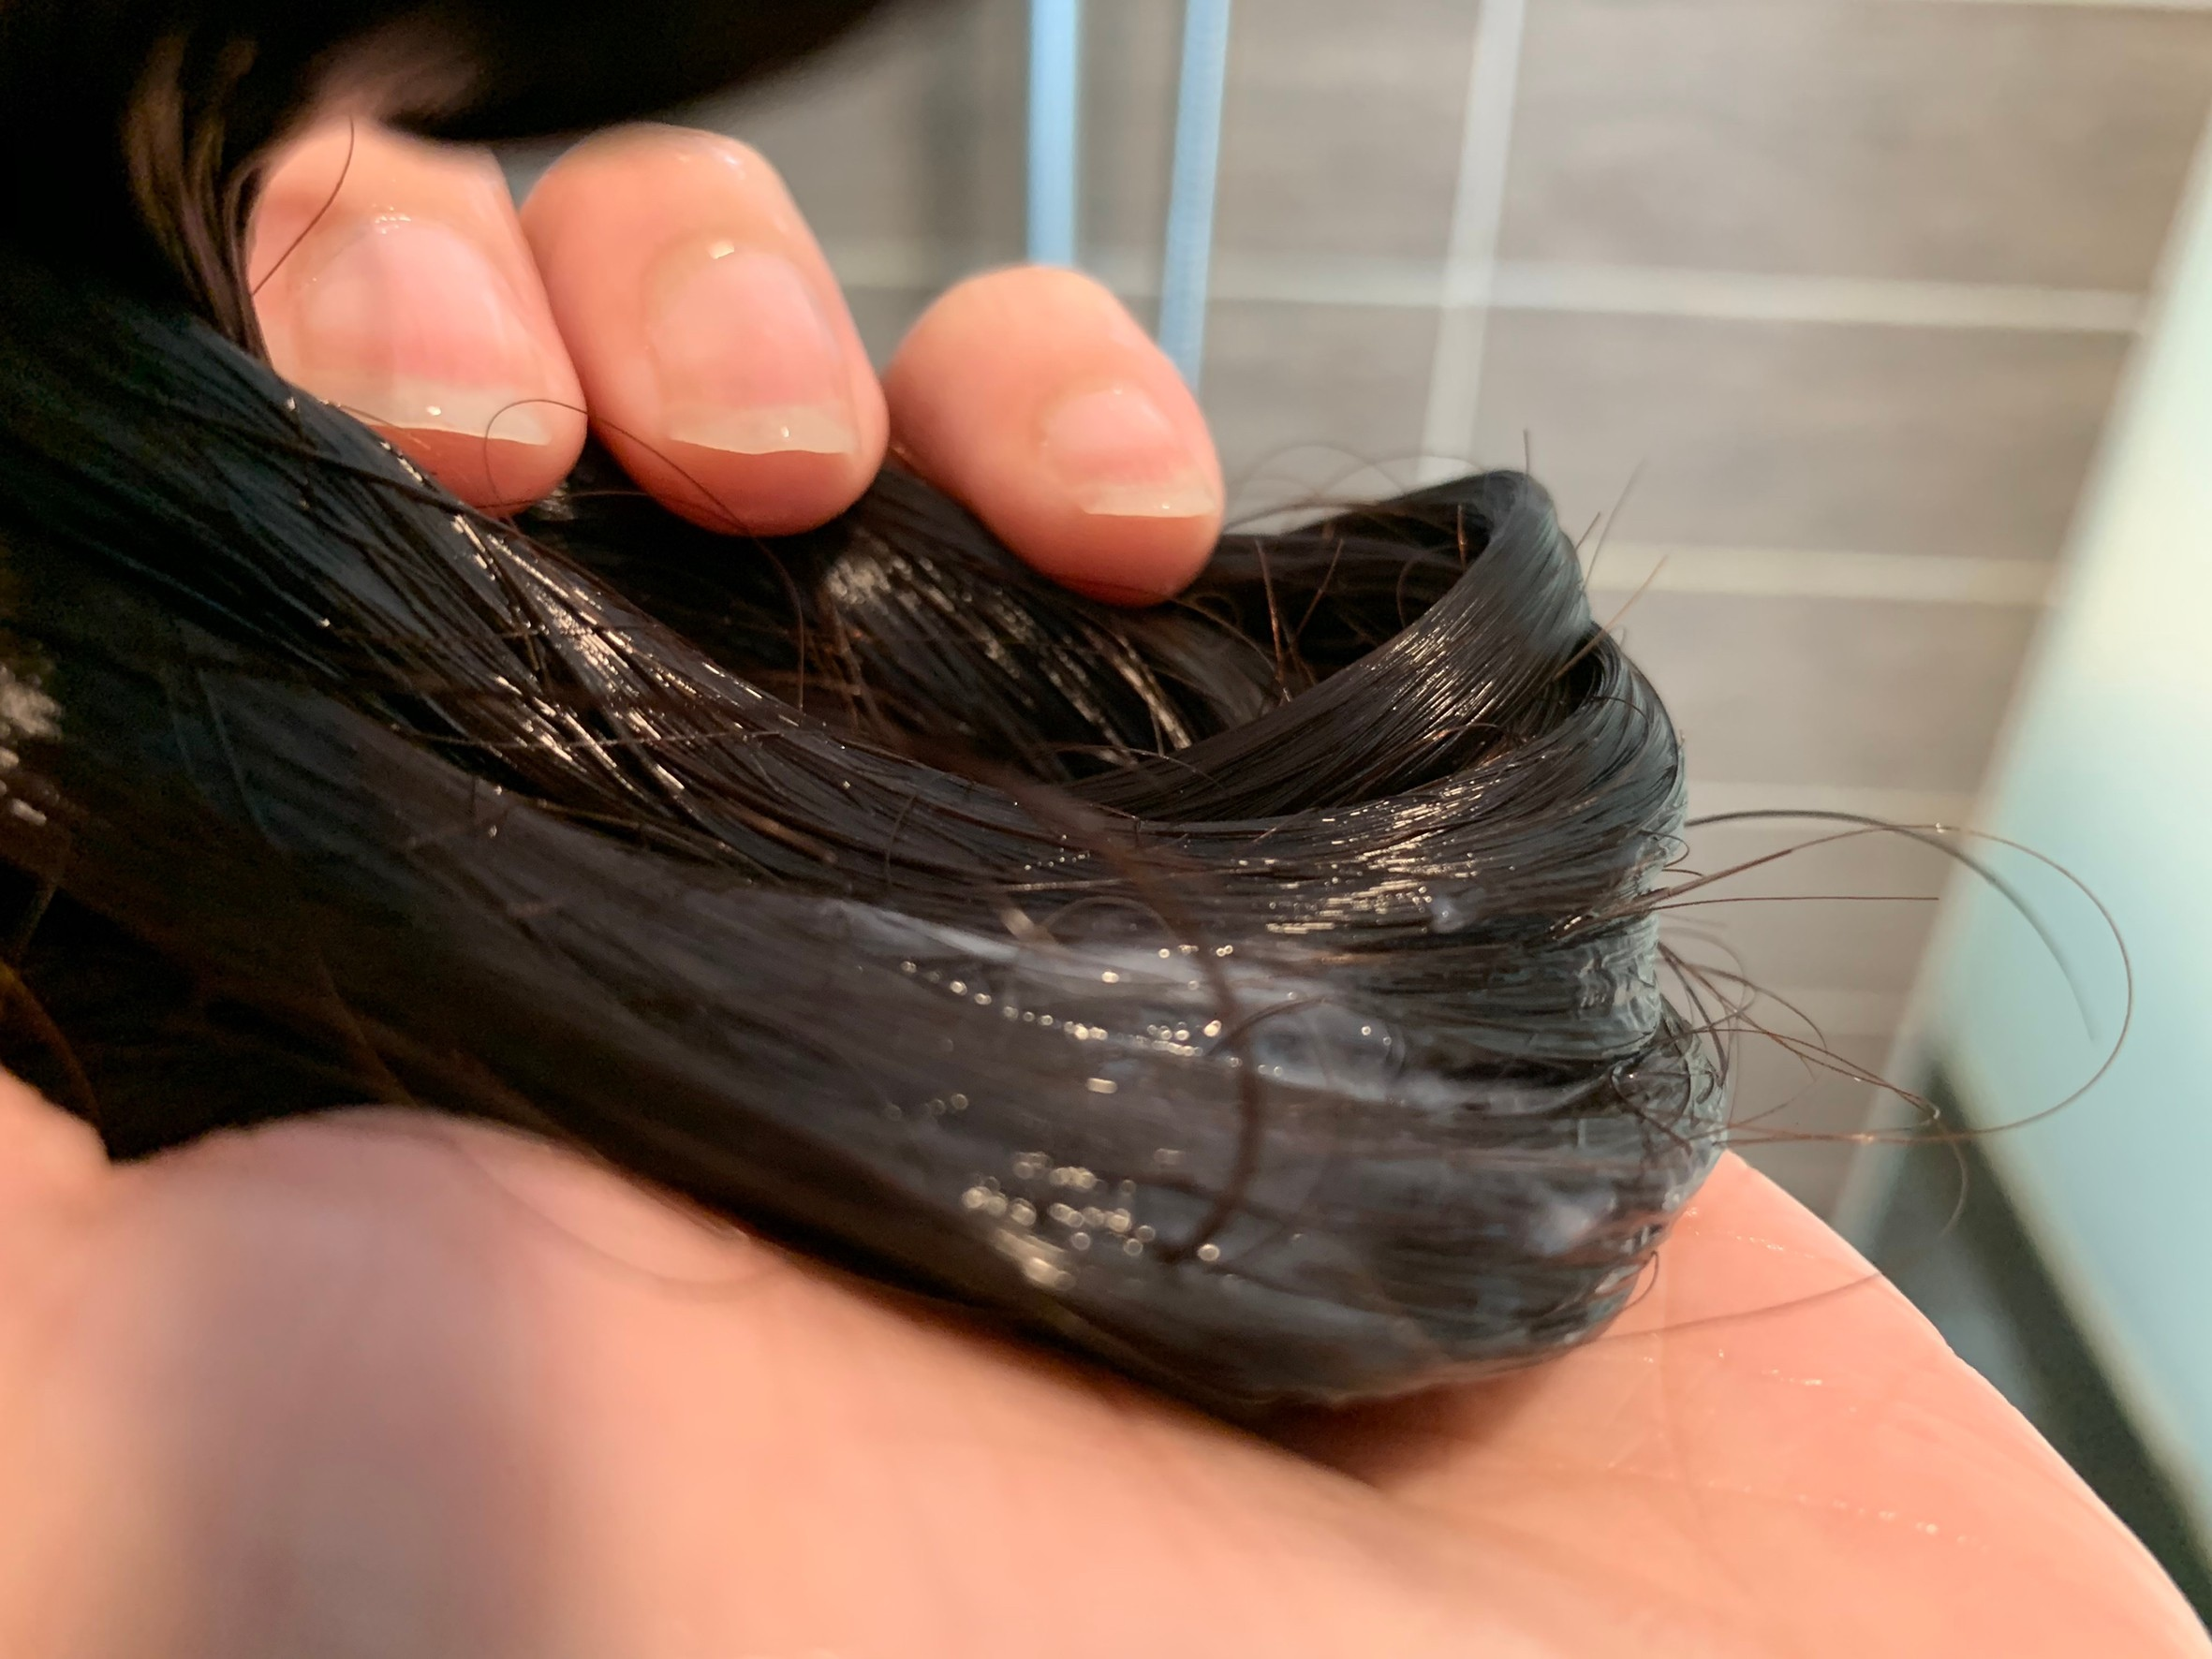 KOSÉ高絲爵戀Je l'aime│AMINO氨基酸系列髮品【18種胺基酸、高保濕海洋GL精華】受損乾燥速效修補,滋潤毛燥乾澀髮尾,還有新清迷人的花果香,洗完頭髮柔順保濕